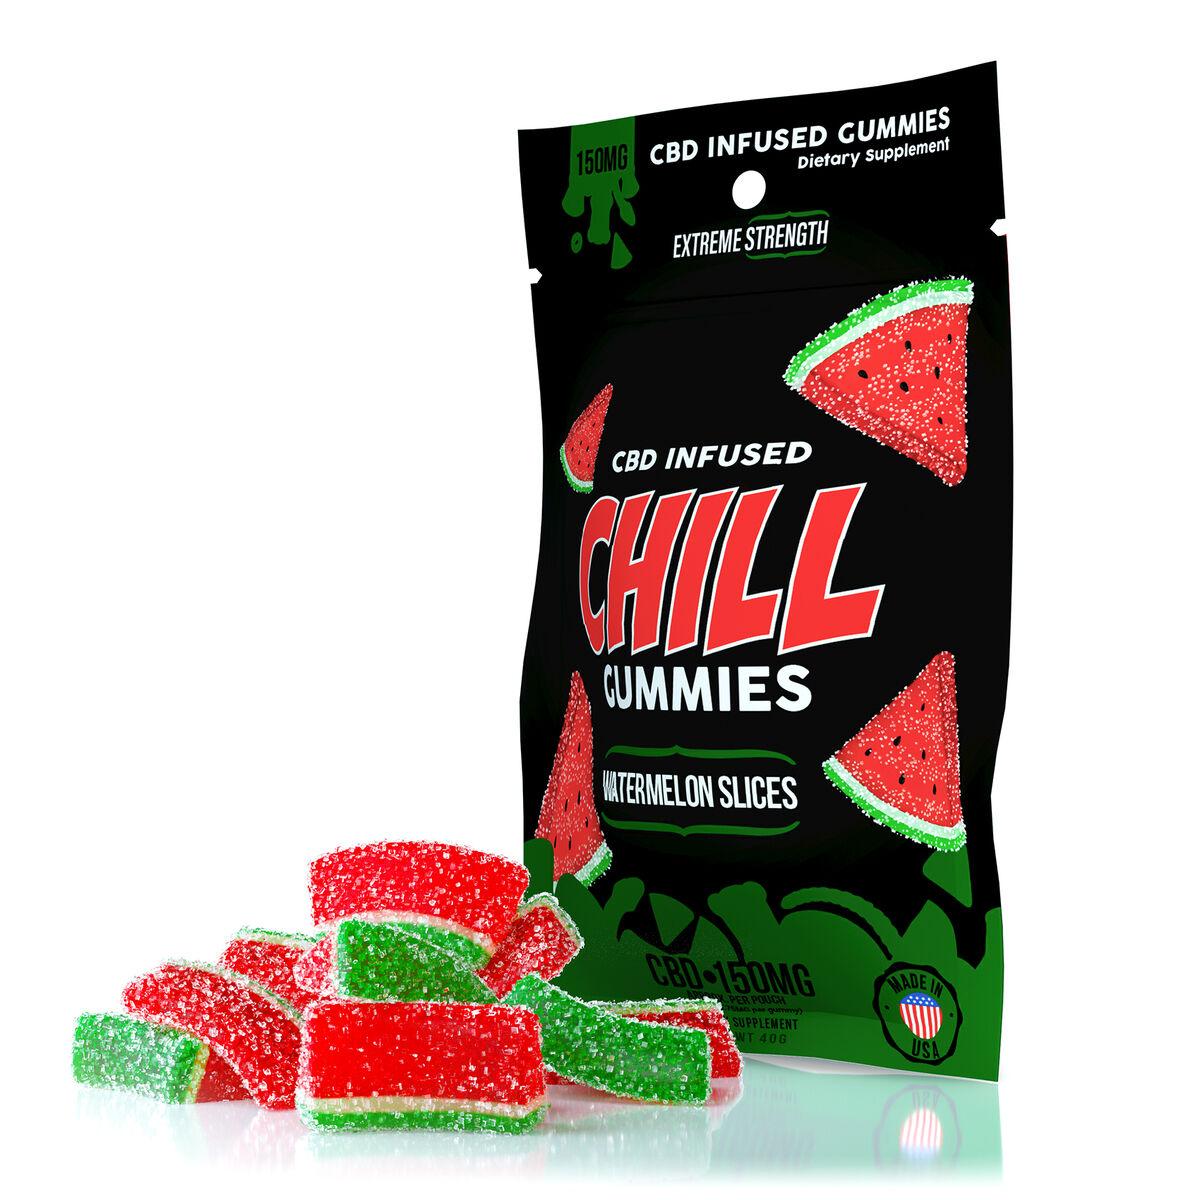 chill-gummies-cbd-infused-watermelon-slices-150mg_0 open.jpg